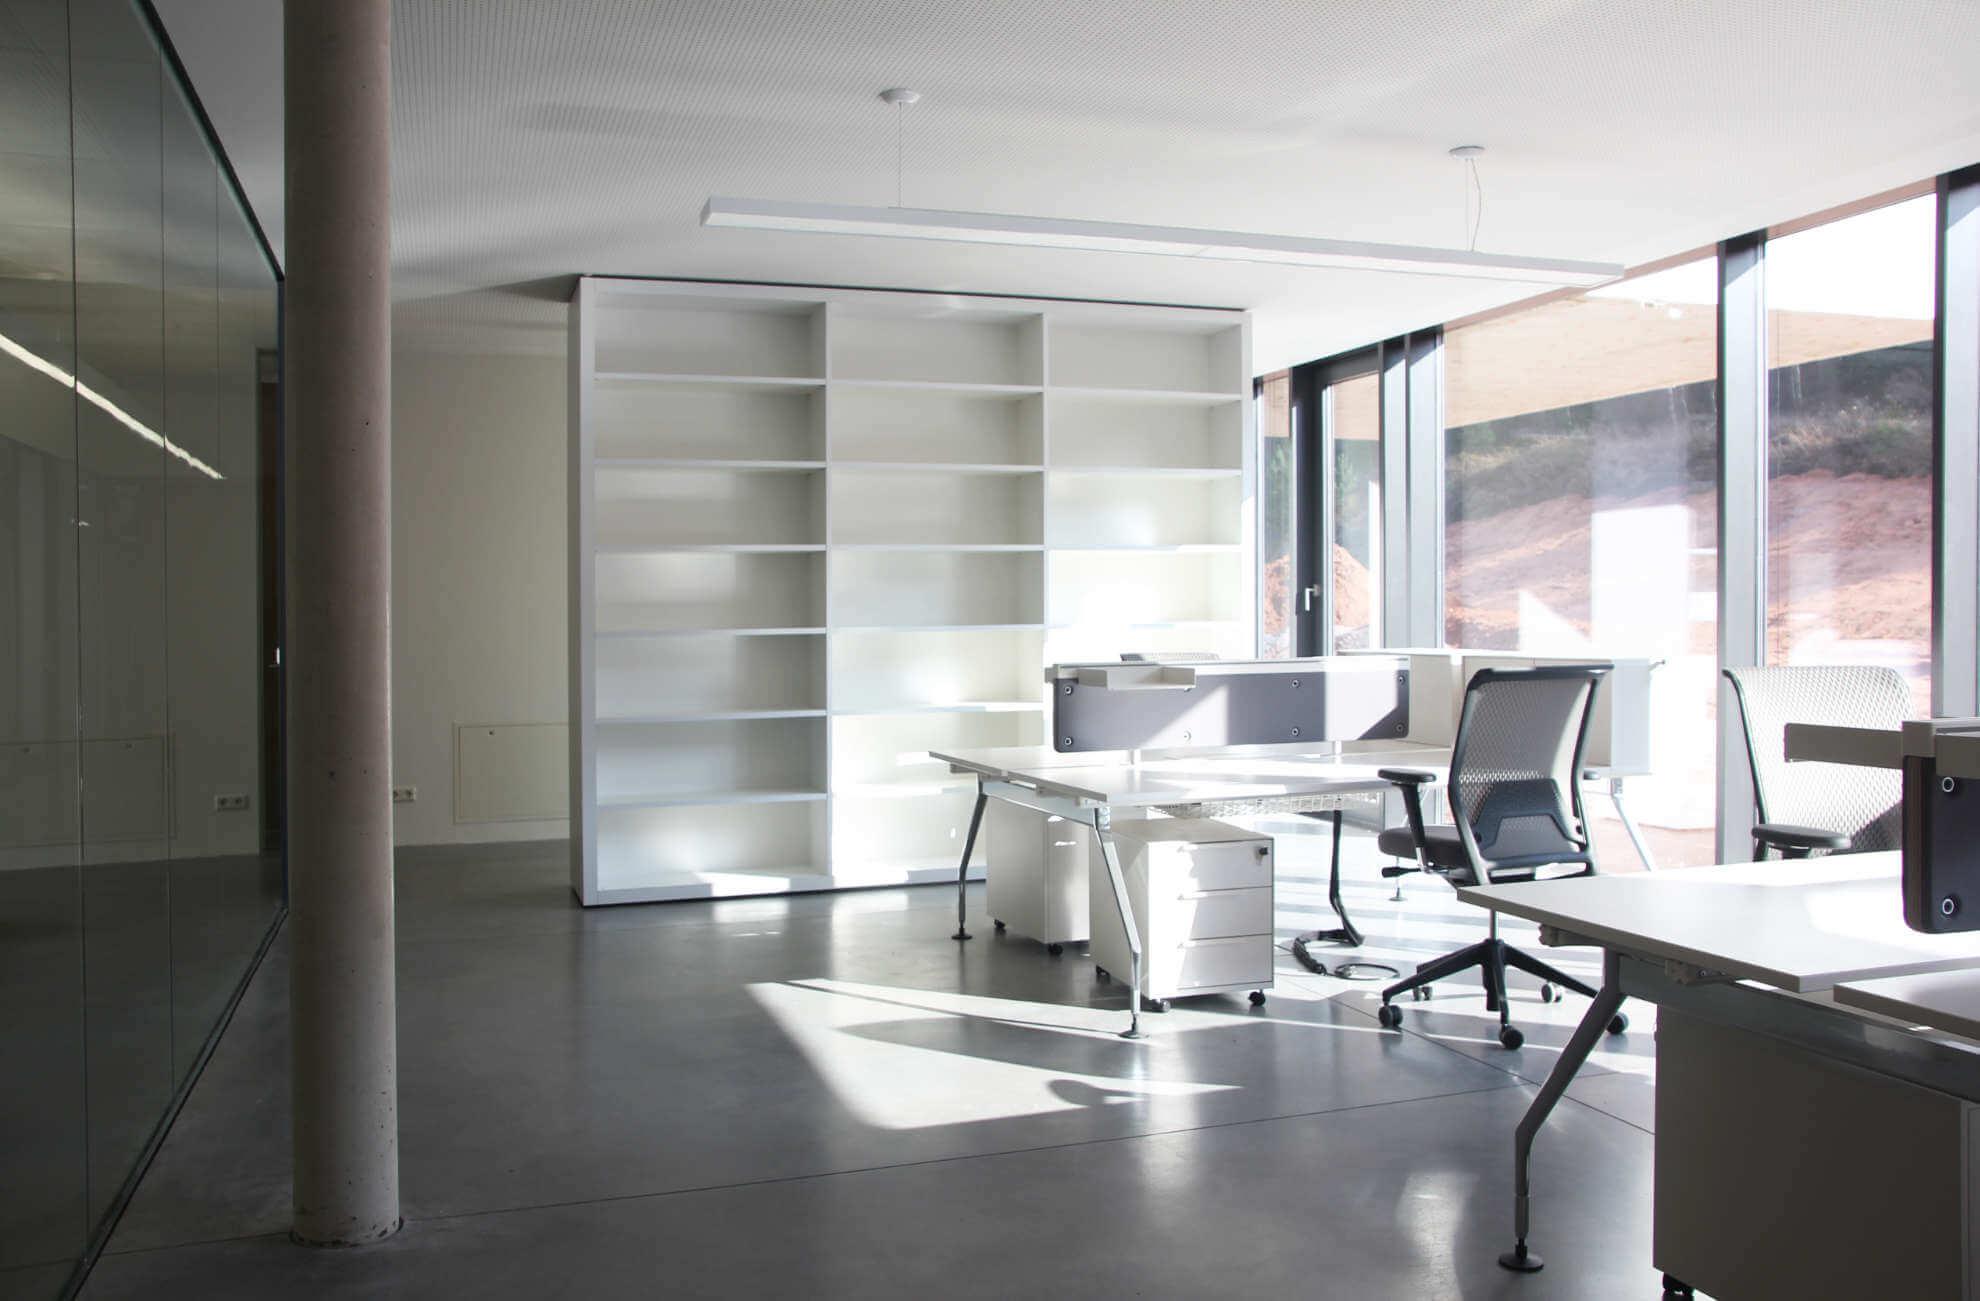 smz-i-10-möbel-marcbetz architekten